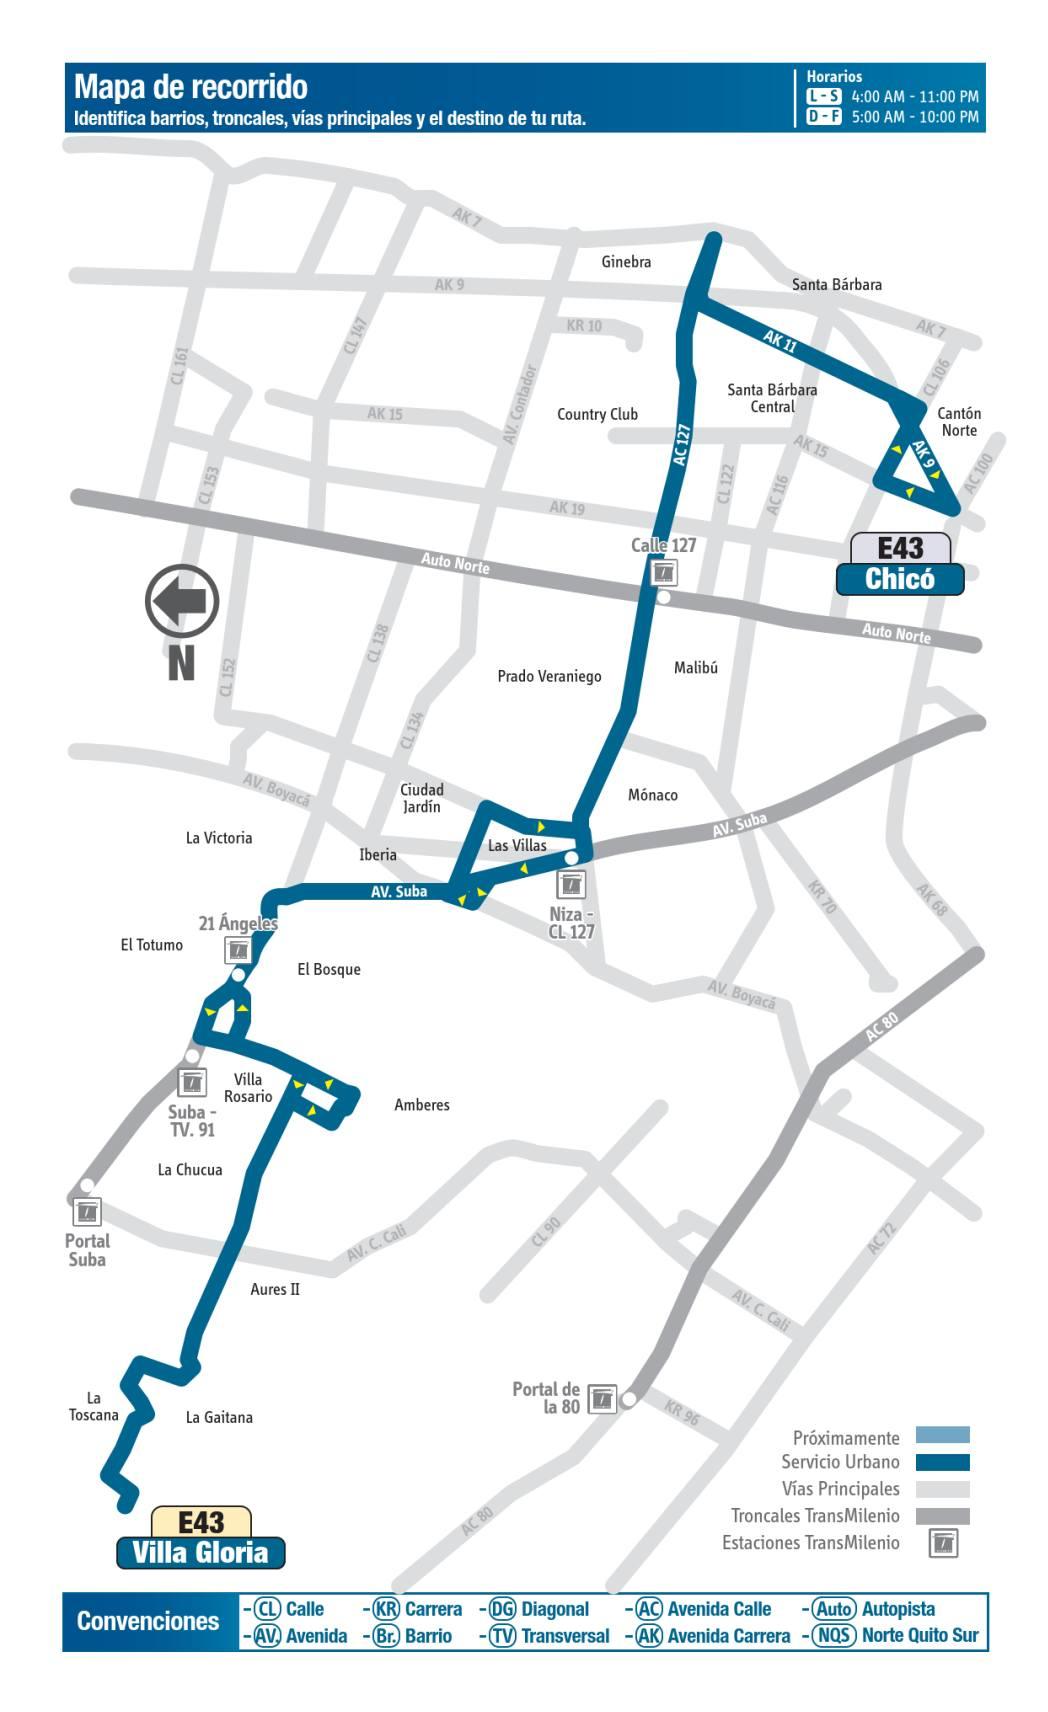 E43 Villa Gloria - Chicó, mapa bus urbano Bogotá